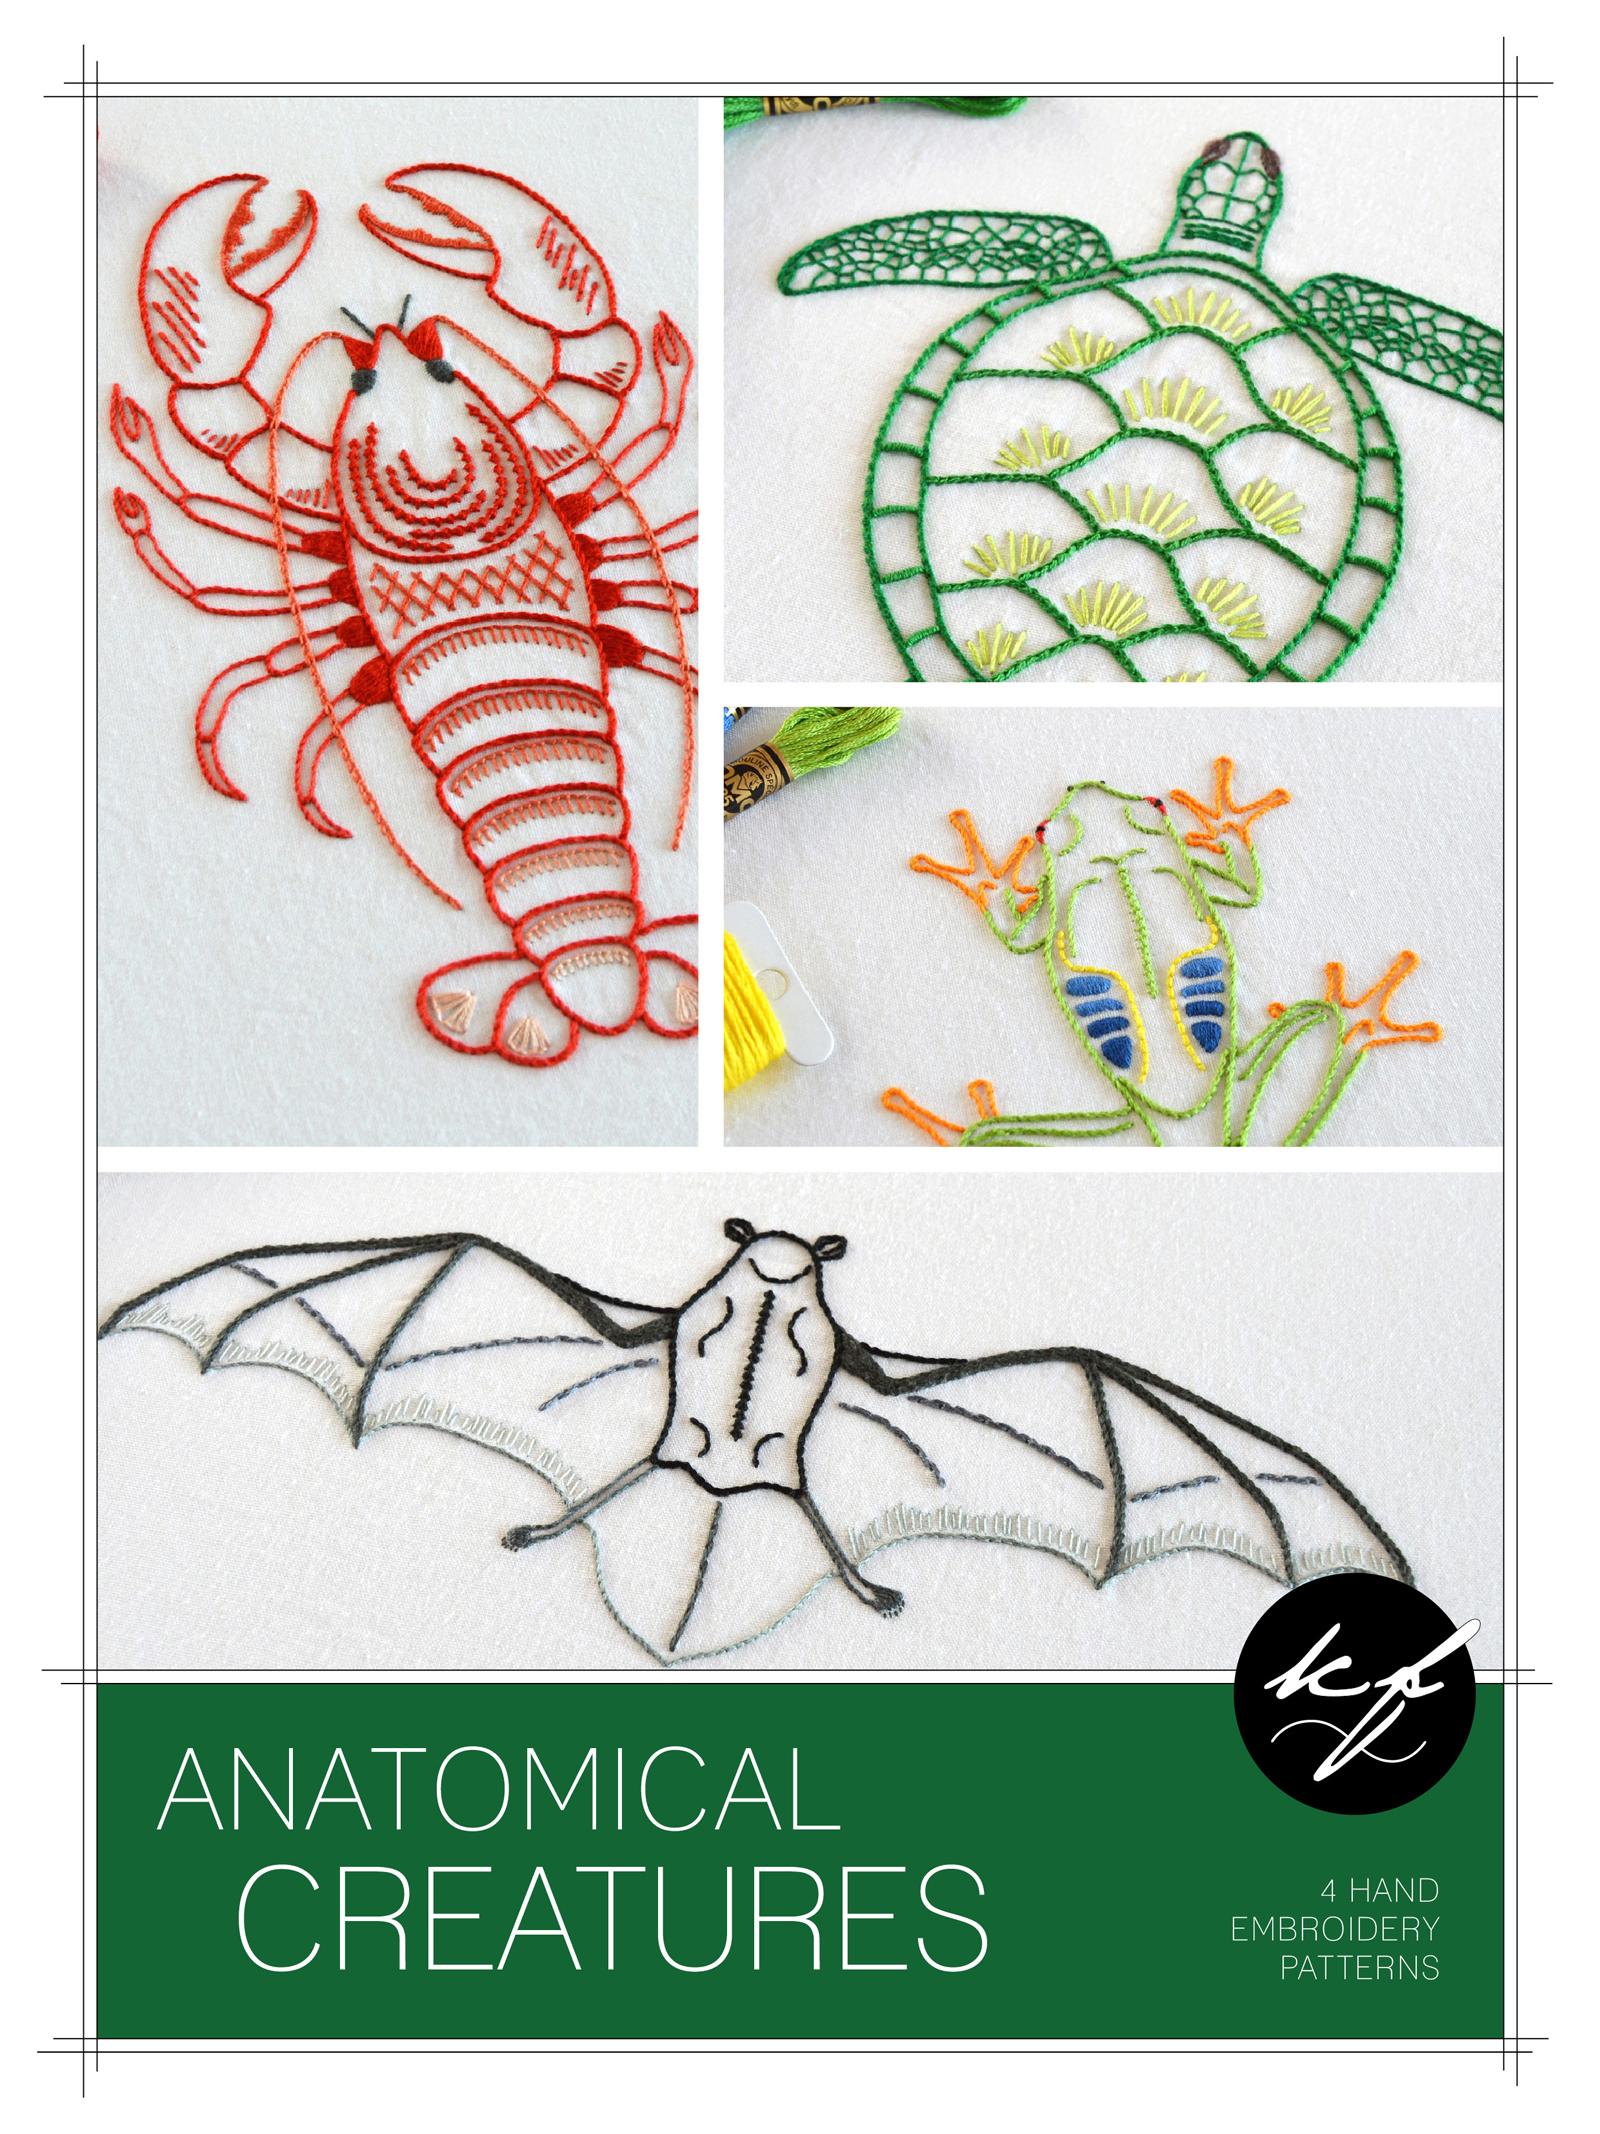 AnatomicalCreaturesEmbroideryPattern19_KellyFletcher.jpg